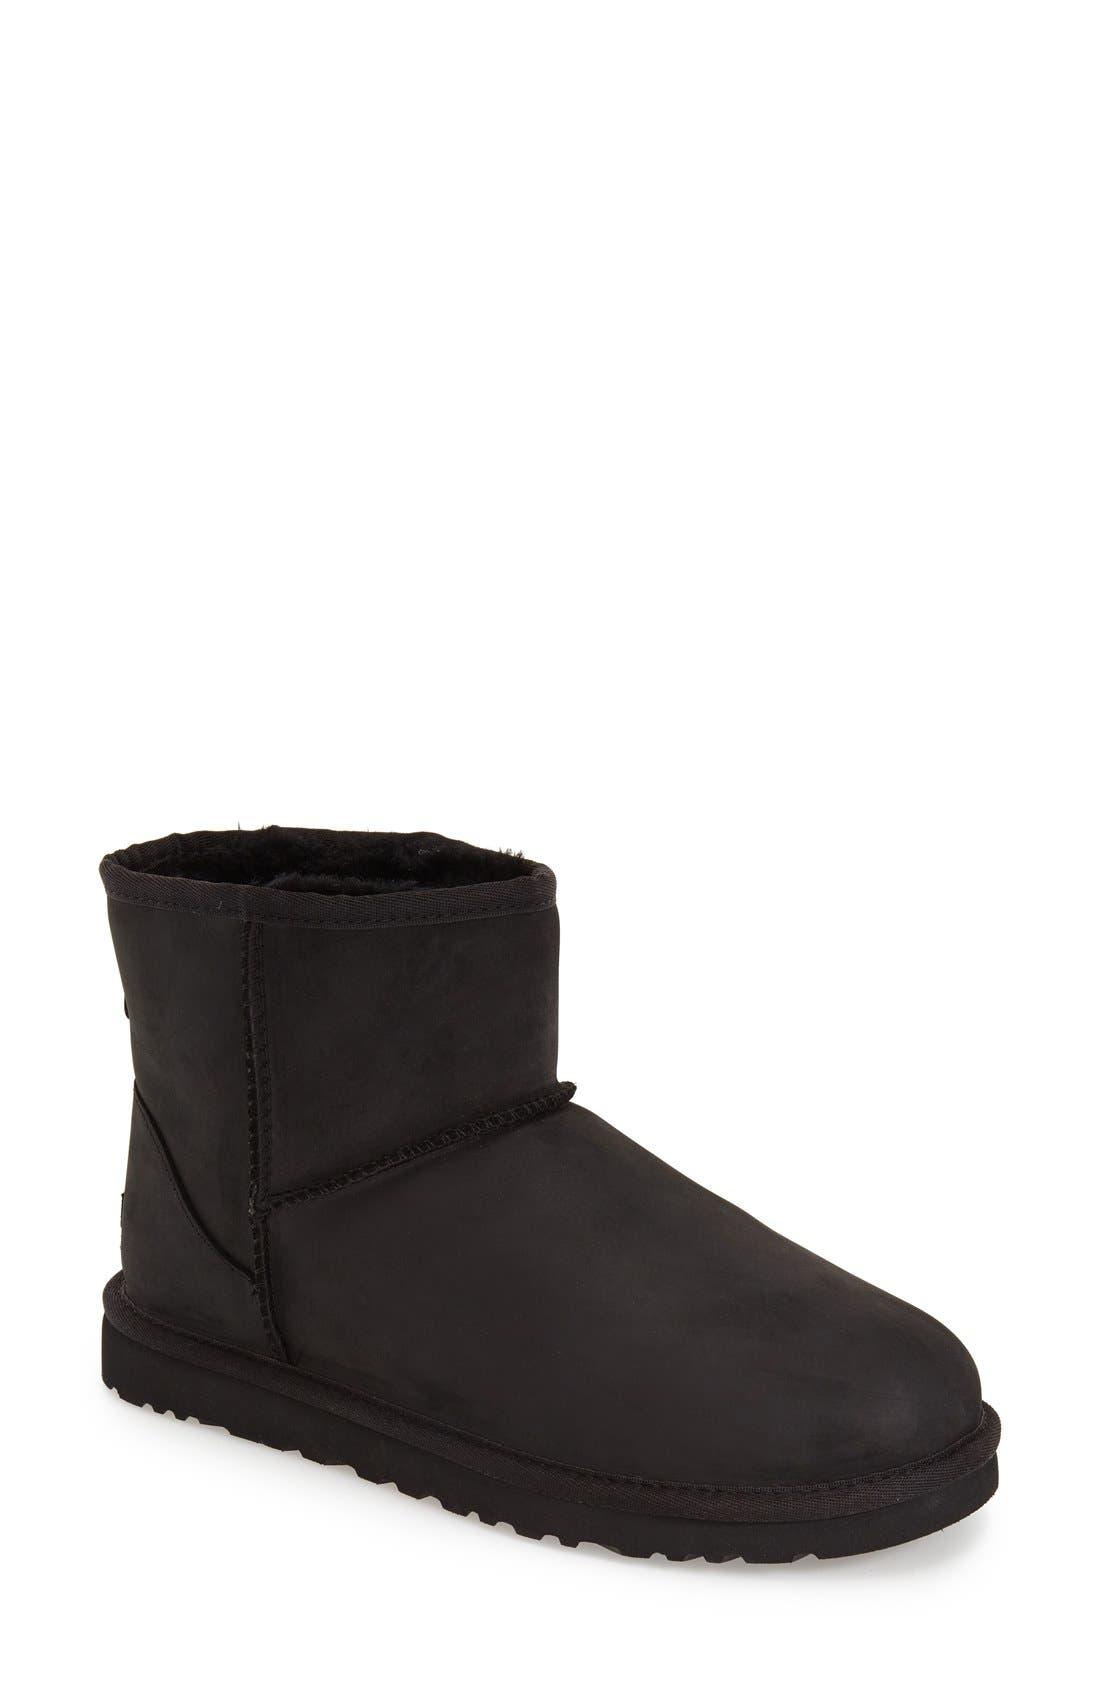 Alternate Image 1 Selected - UGG® Classic Mini Boot (Women)